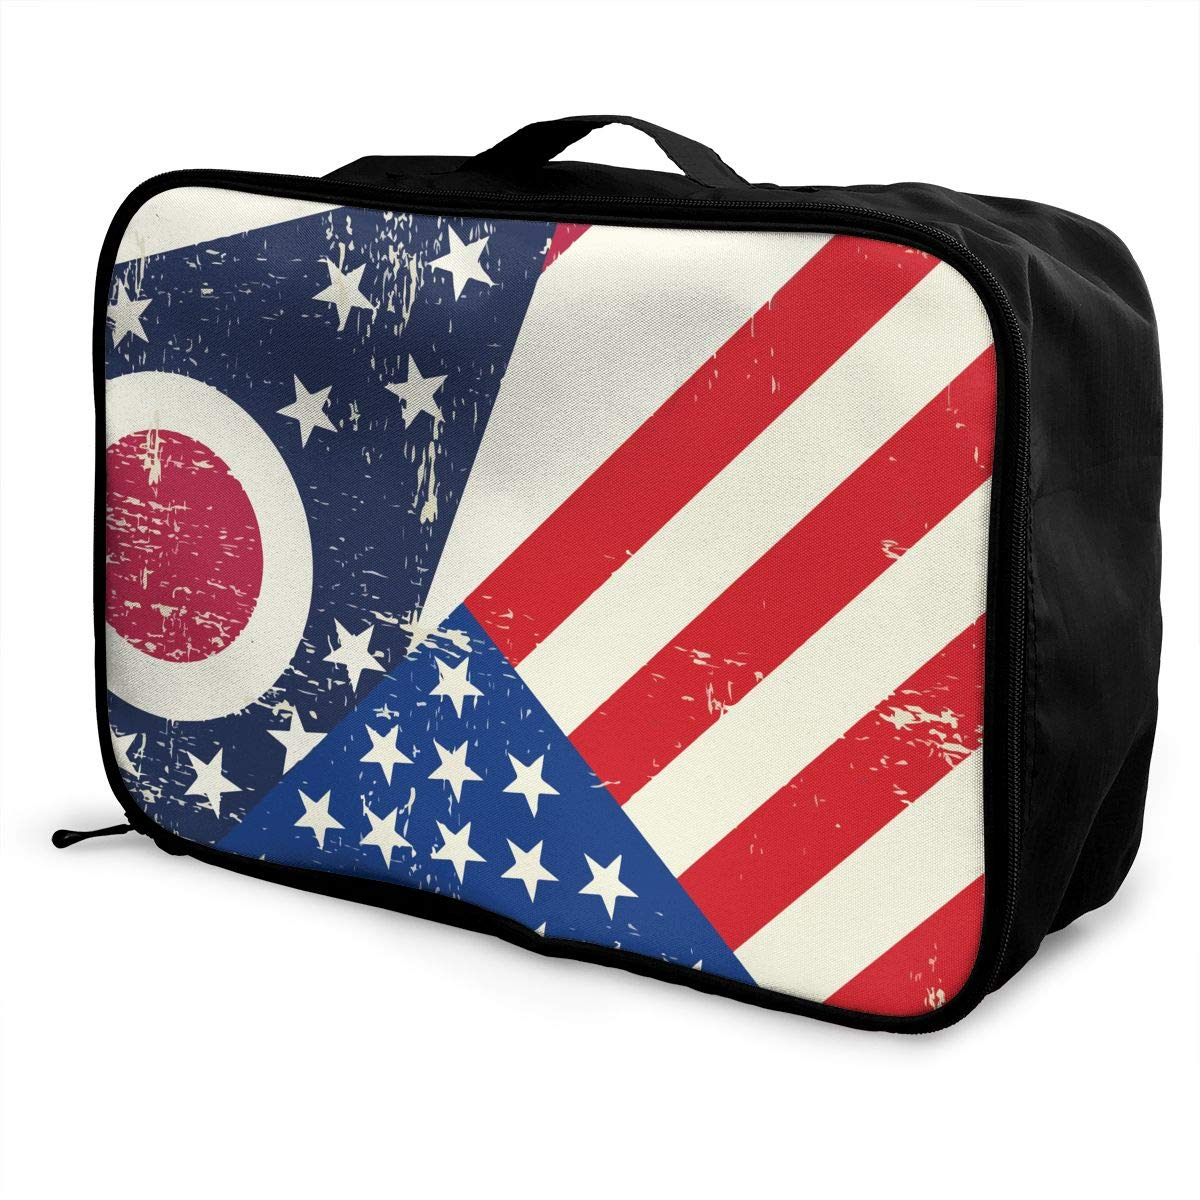 YueLJB USA Ohio State Flag Lightweight Large Capacity Portable Luggage Bag Travel Duffel Bag Storage Carry Luggage Duffle Tote Bag